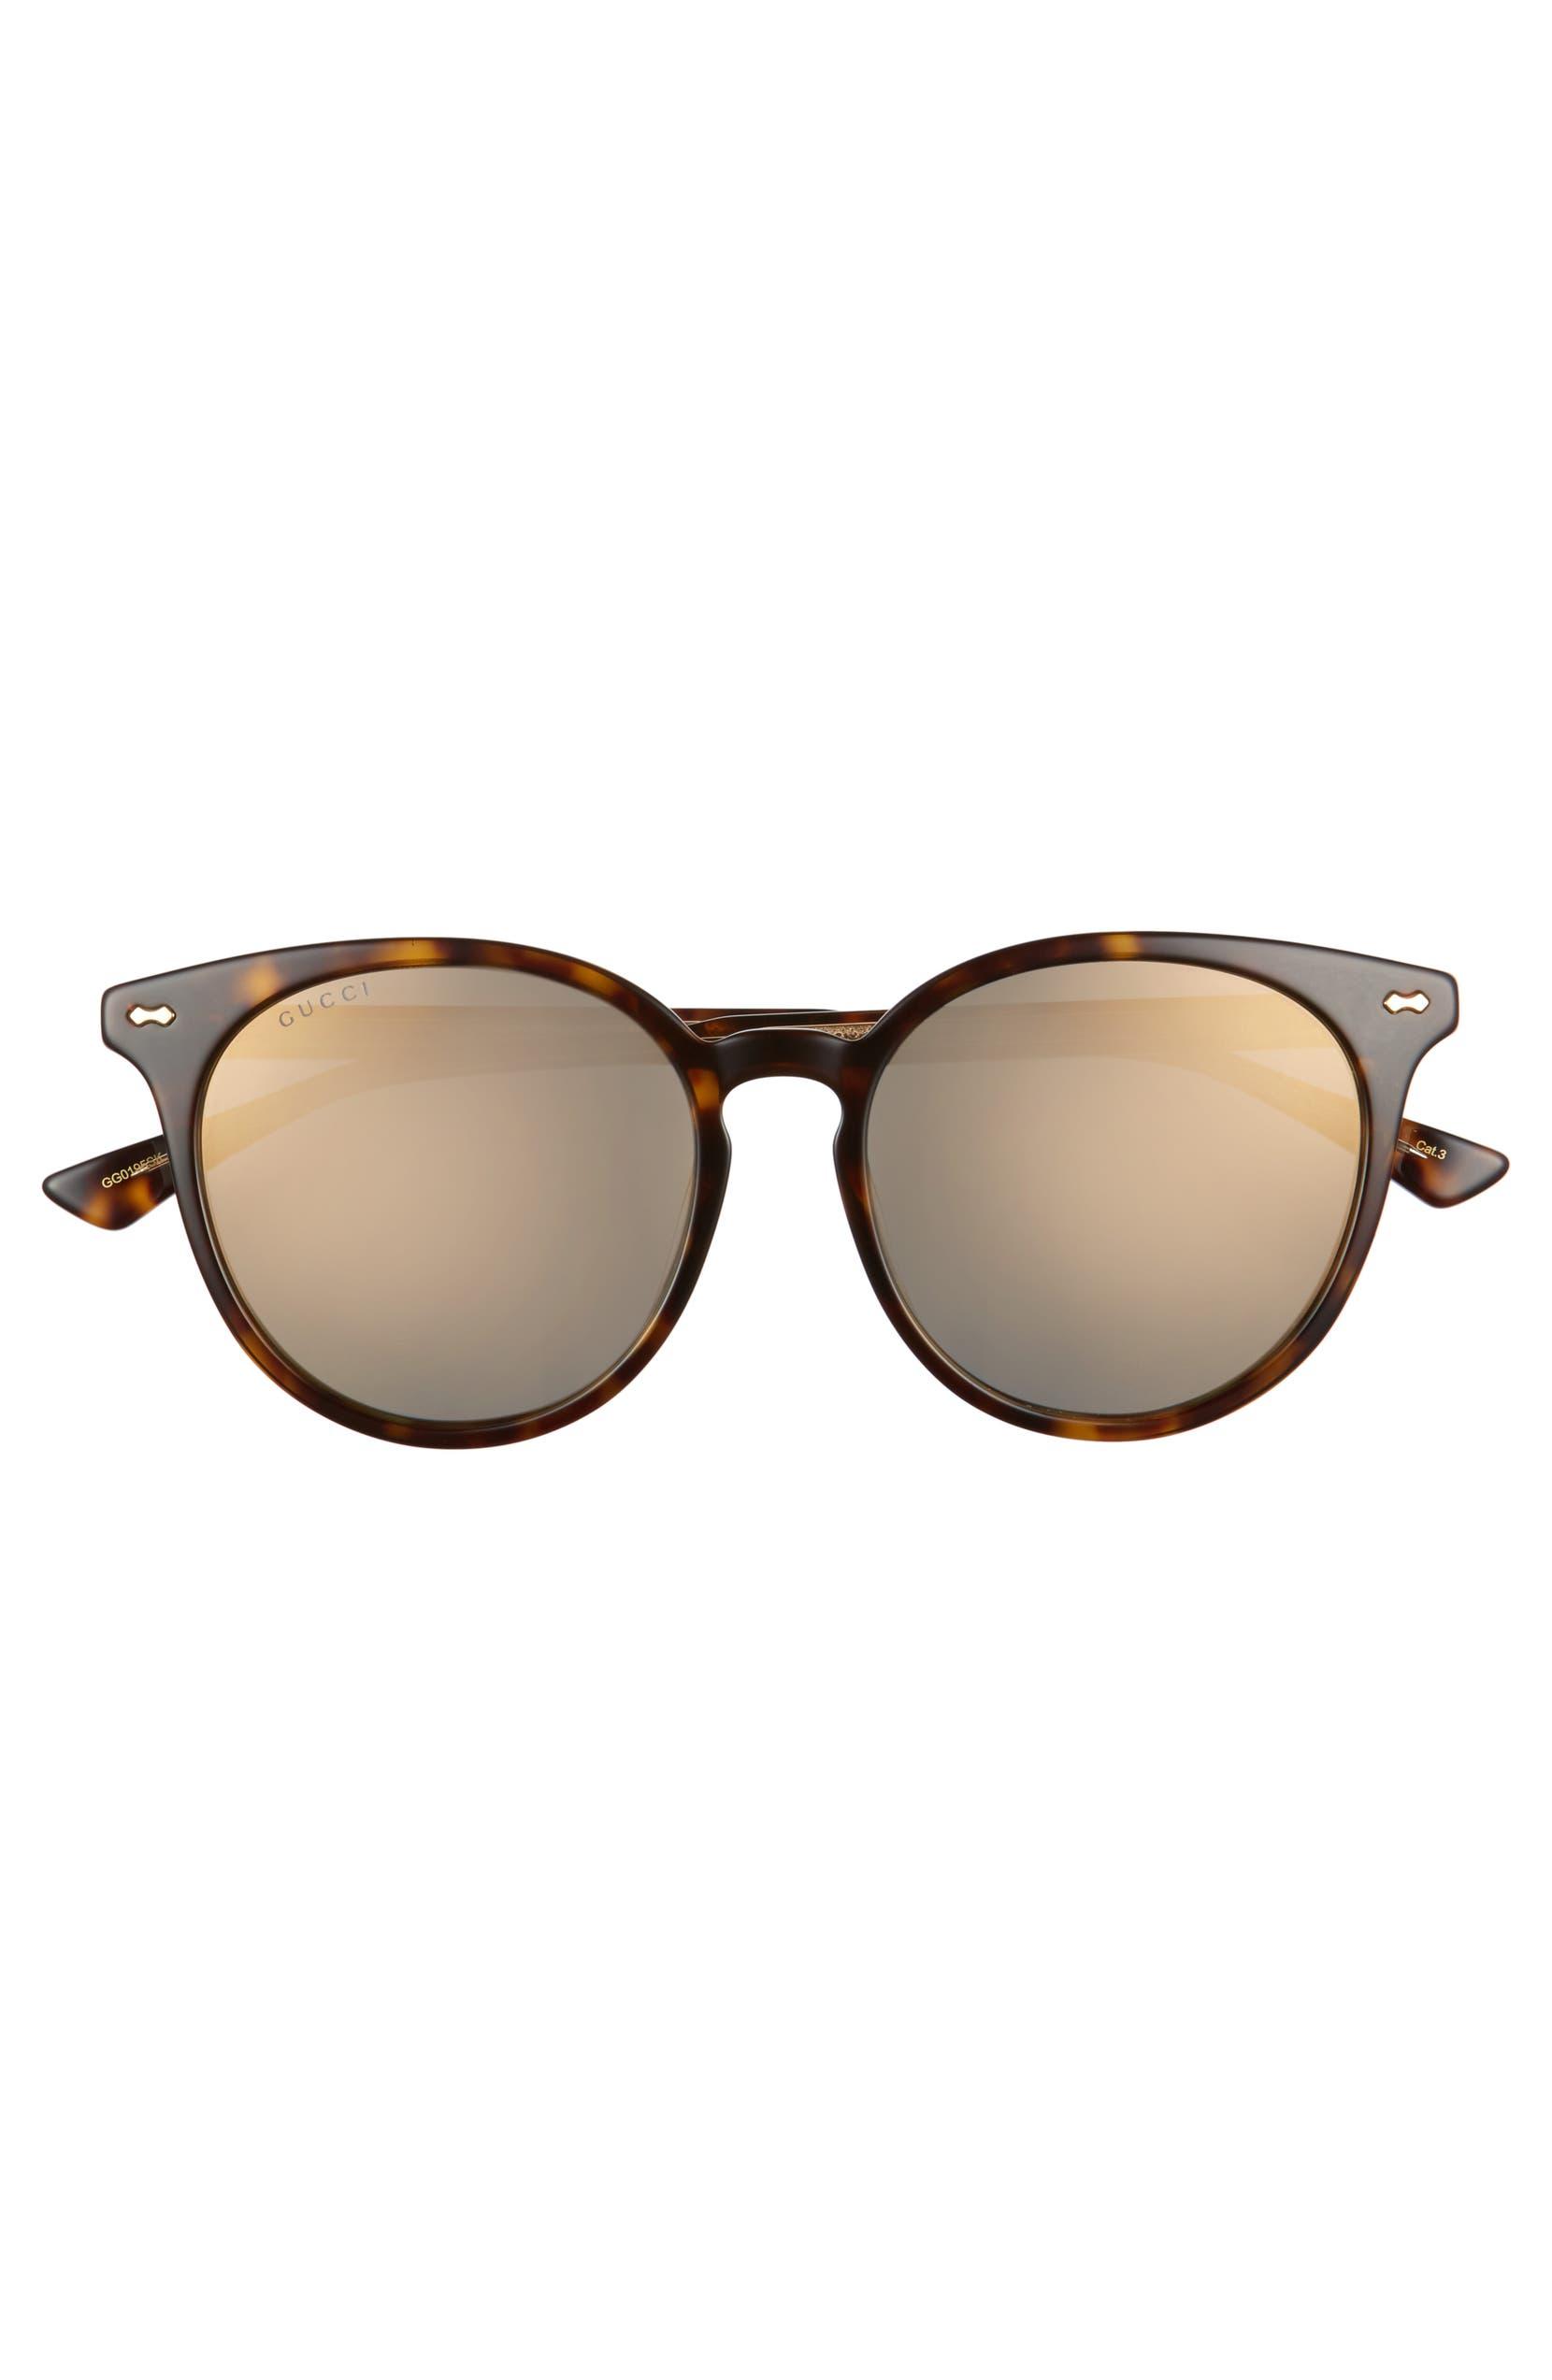 62287f6a6e Gucci 55mm Round Cat Eye Sunglasses